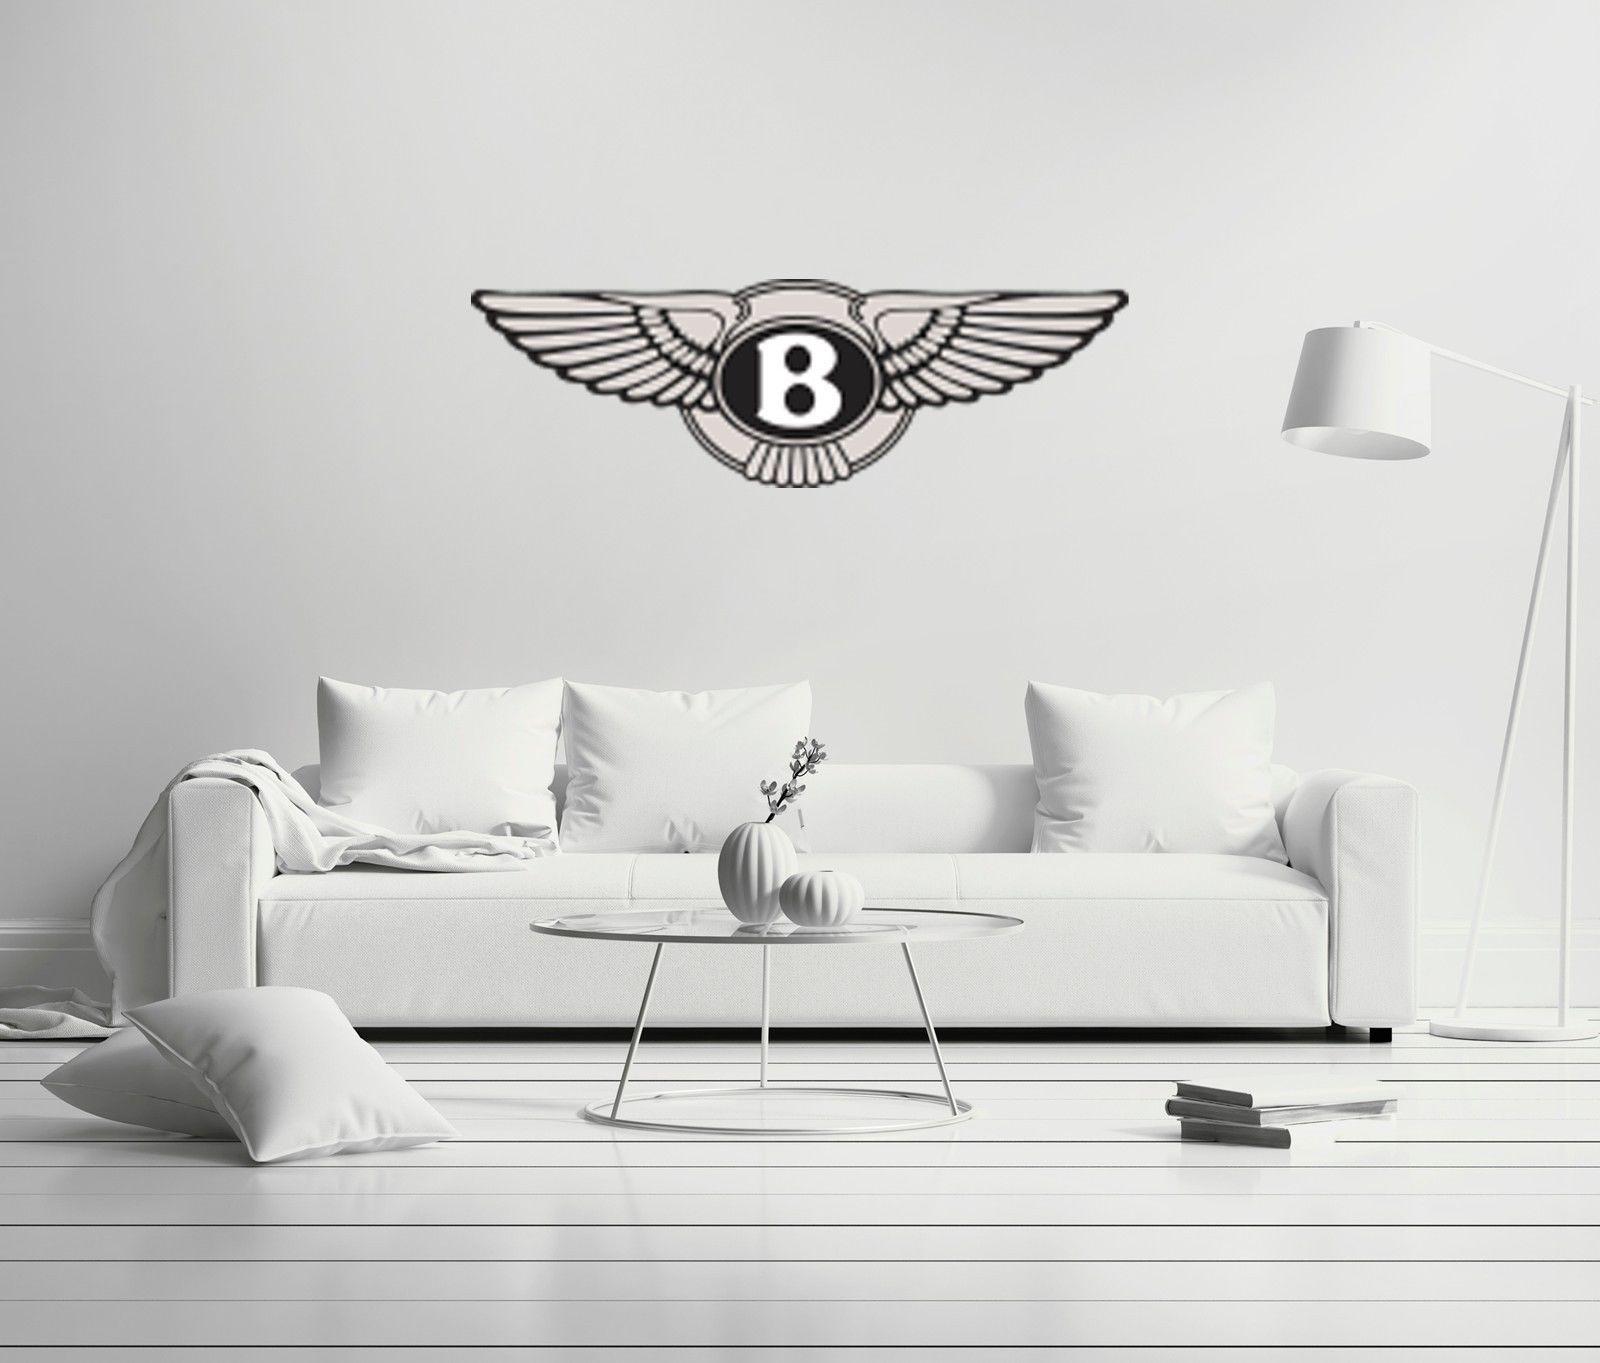 Luxury Cars: Bentley Shield Cars Company Luxury Wall Decal